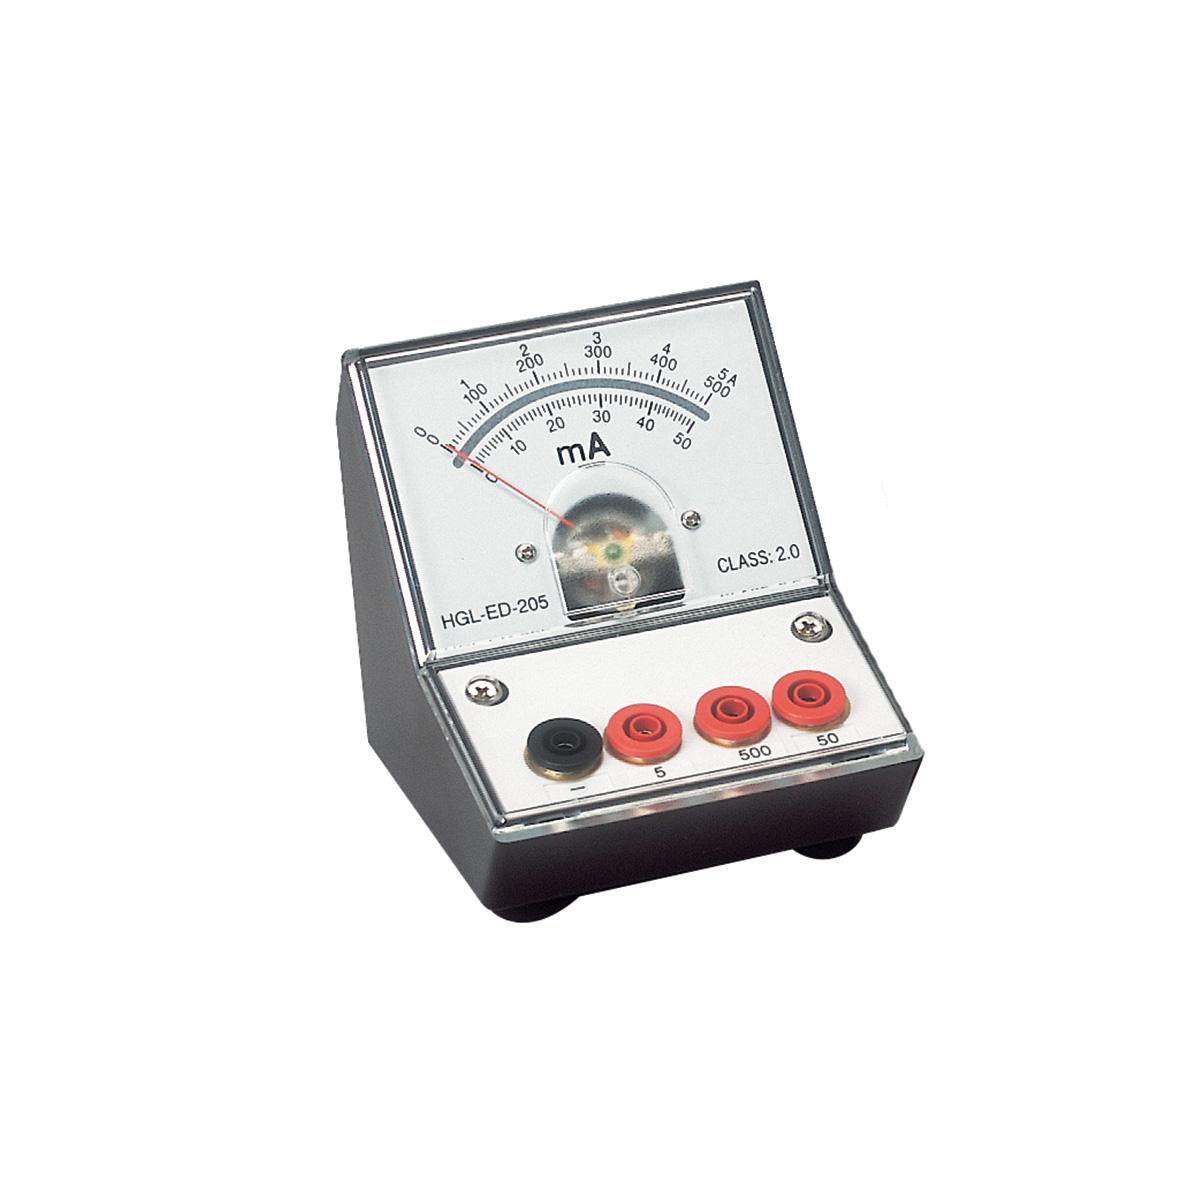 Analog Dc Ammeter : Dc ammeter peaktech u hand held